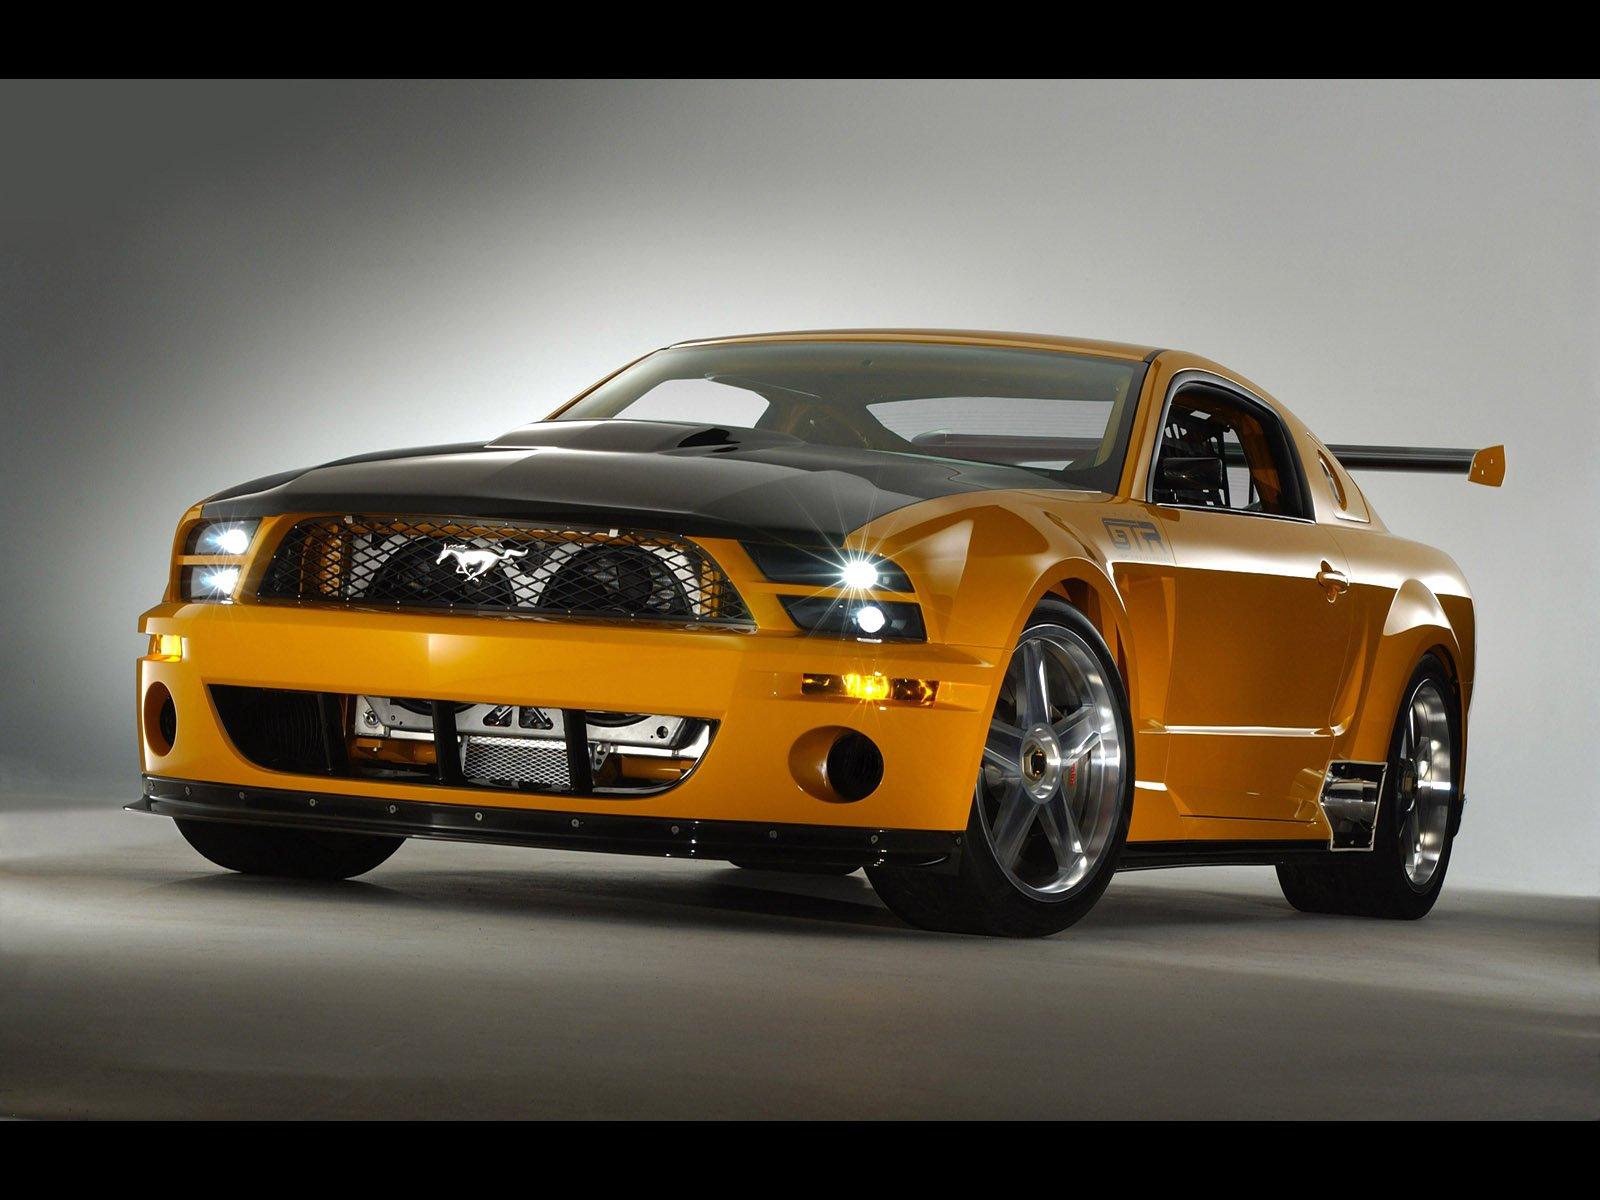 Ford Mustang GTR Concept Desktop Wallpaper